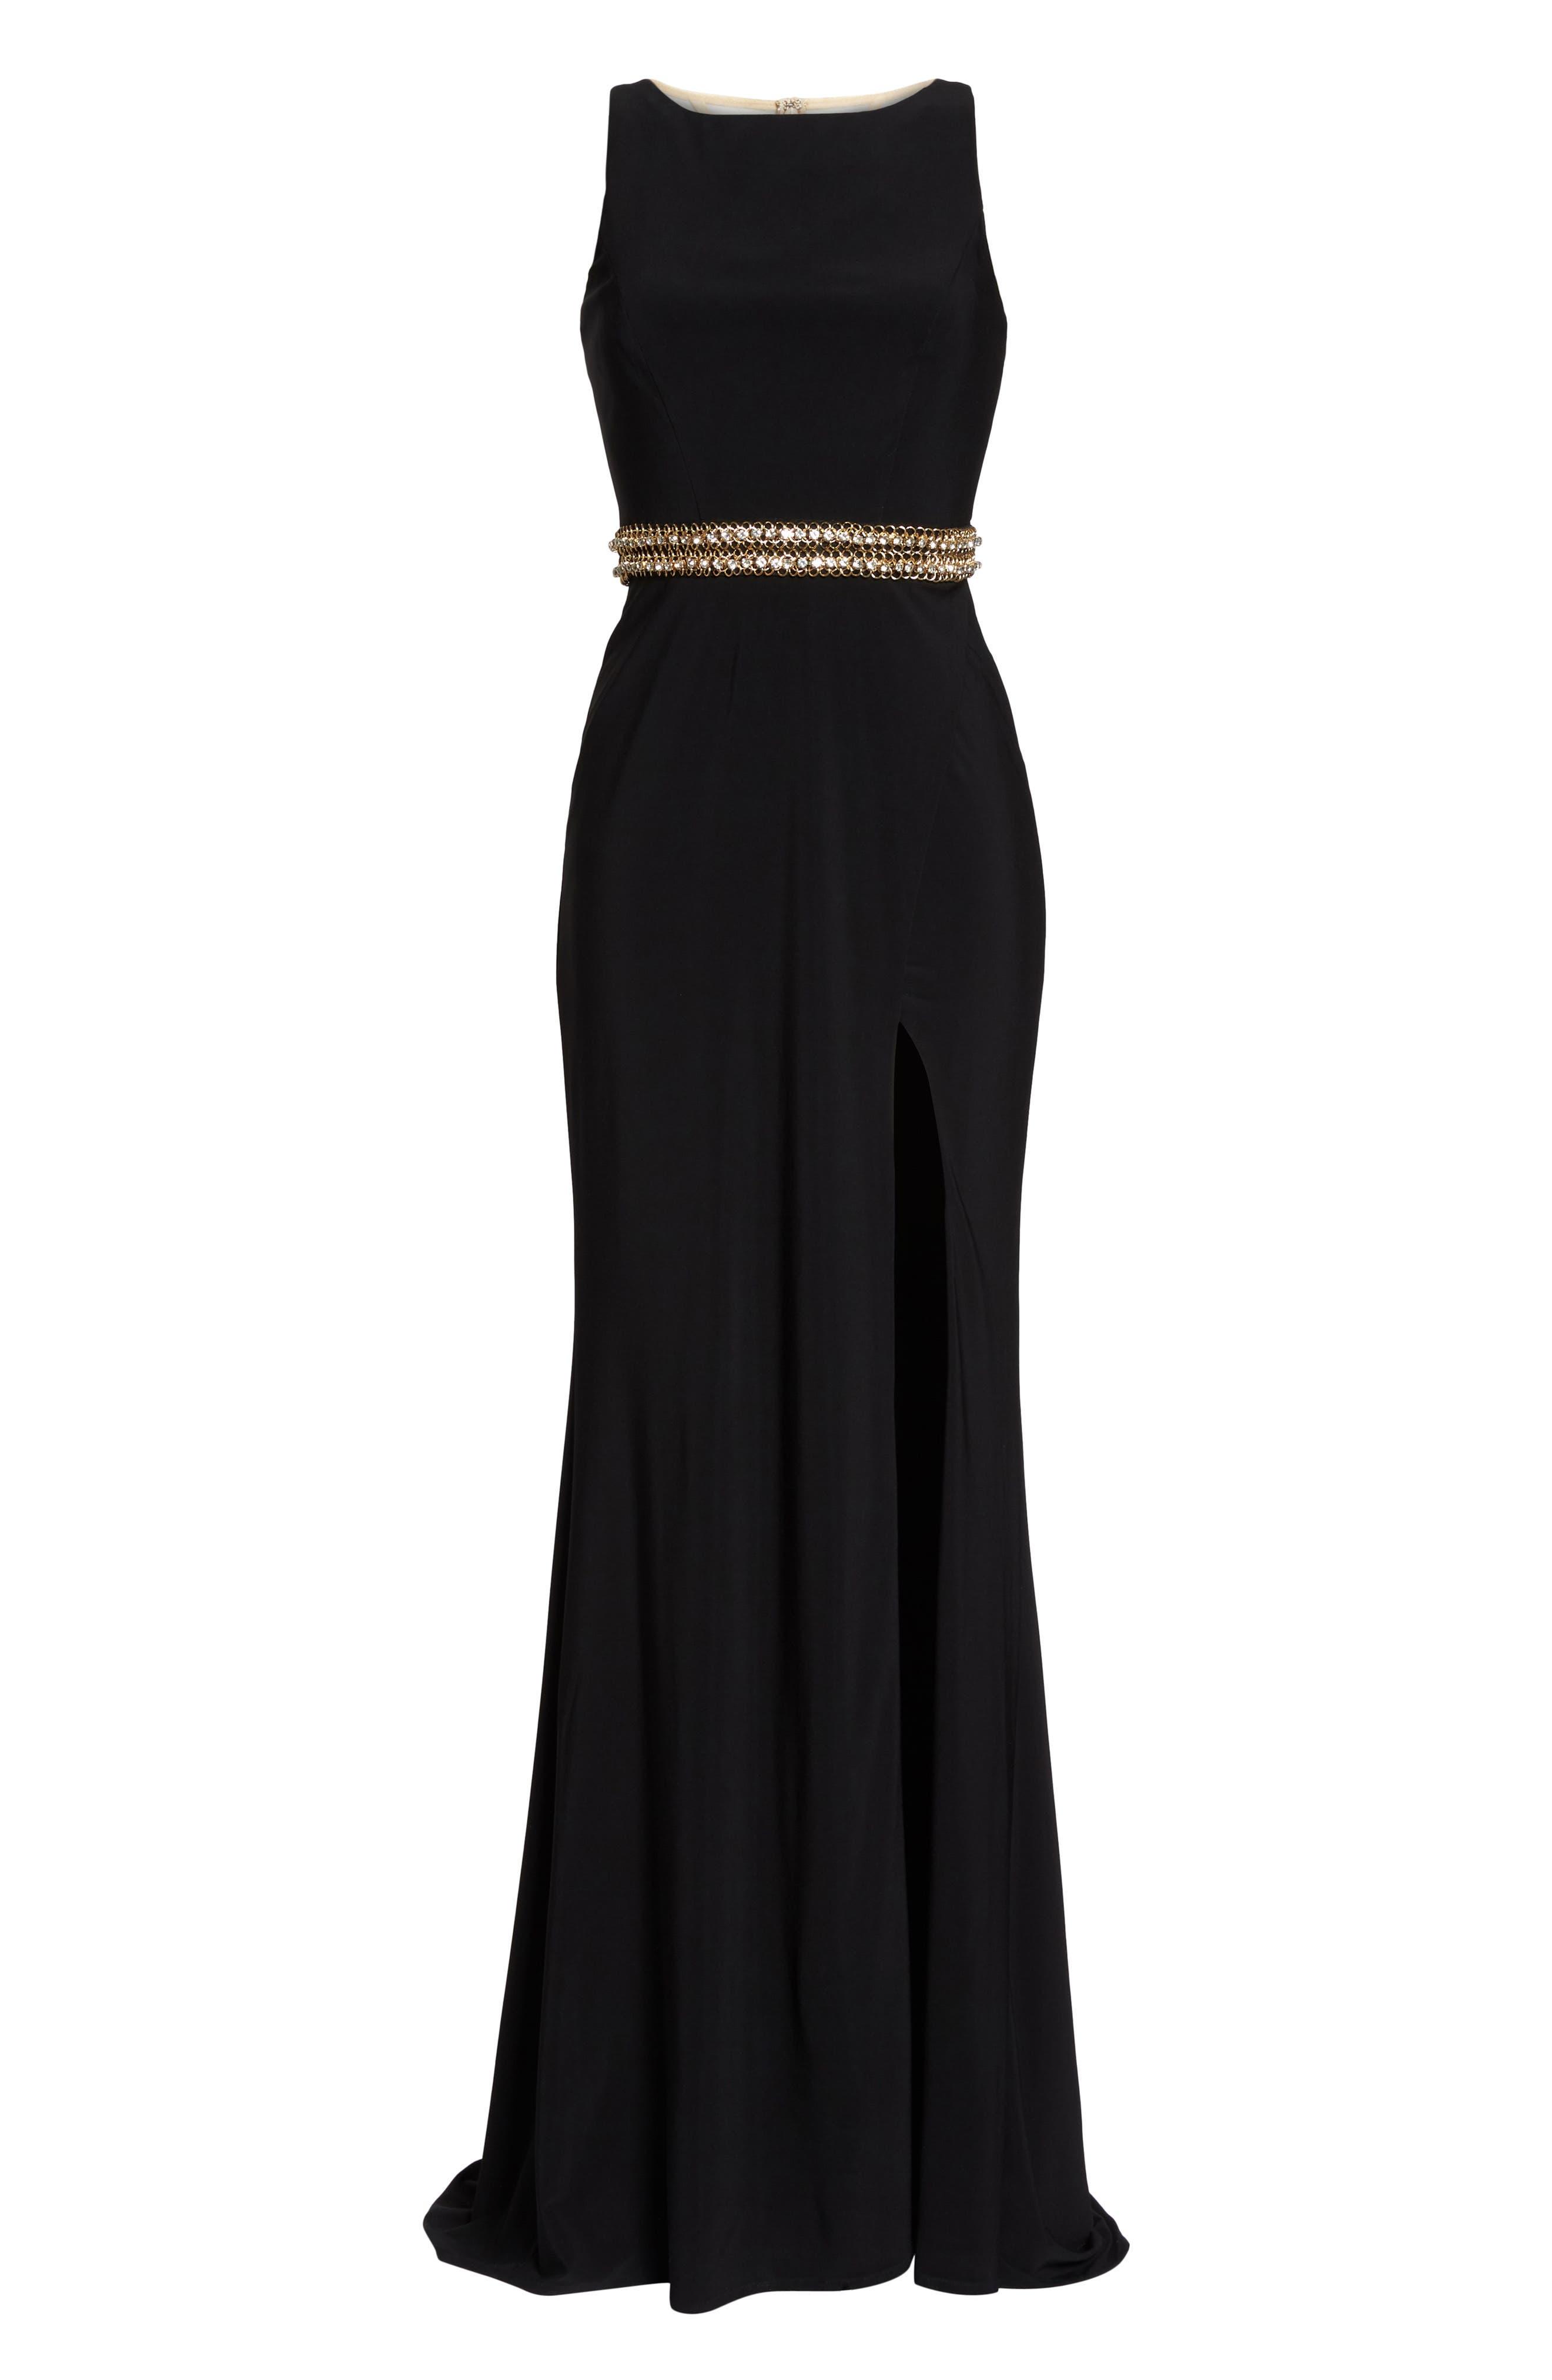 MAC DUGGAL, Embellished Waist Gown, Alternate thumbnail 6, color, BLACK